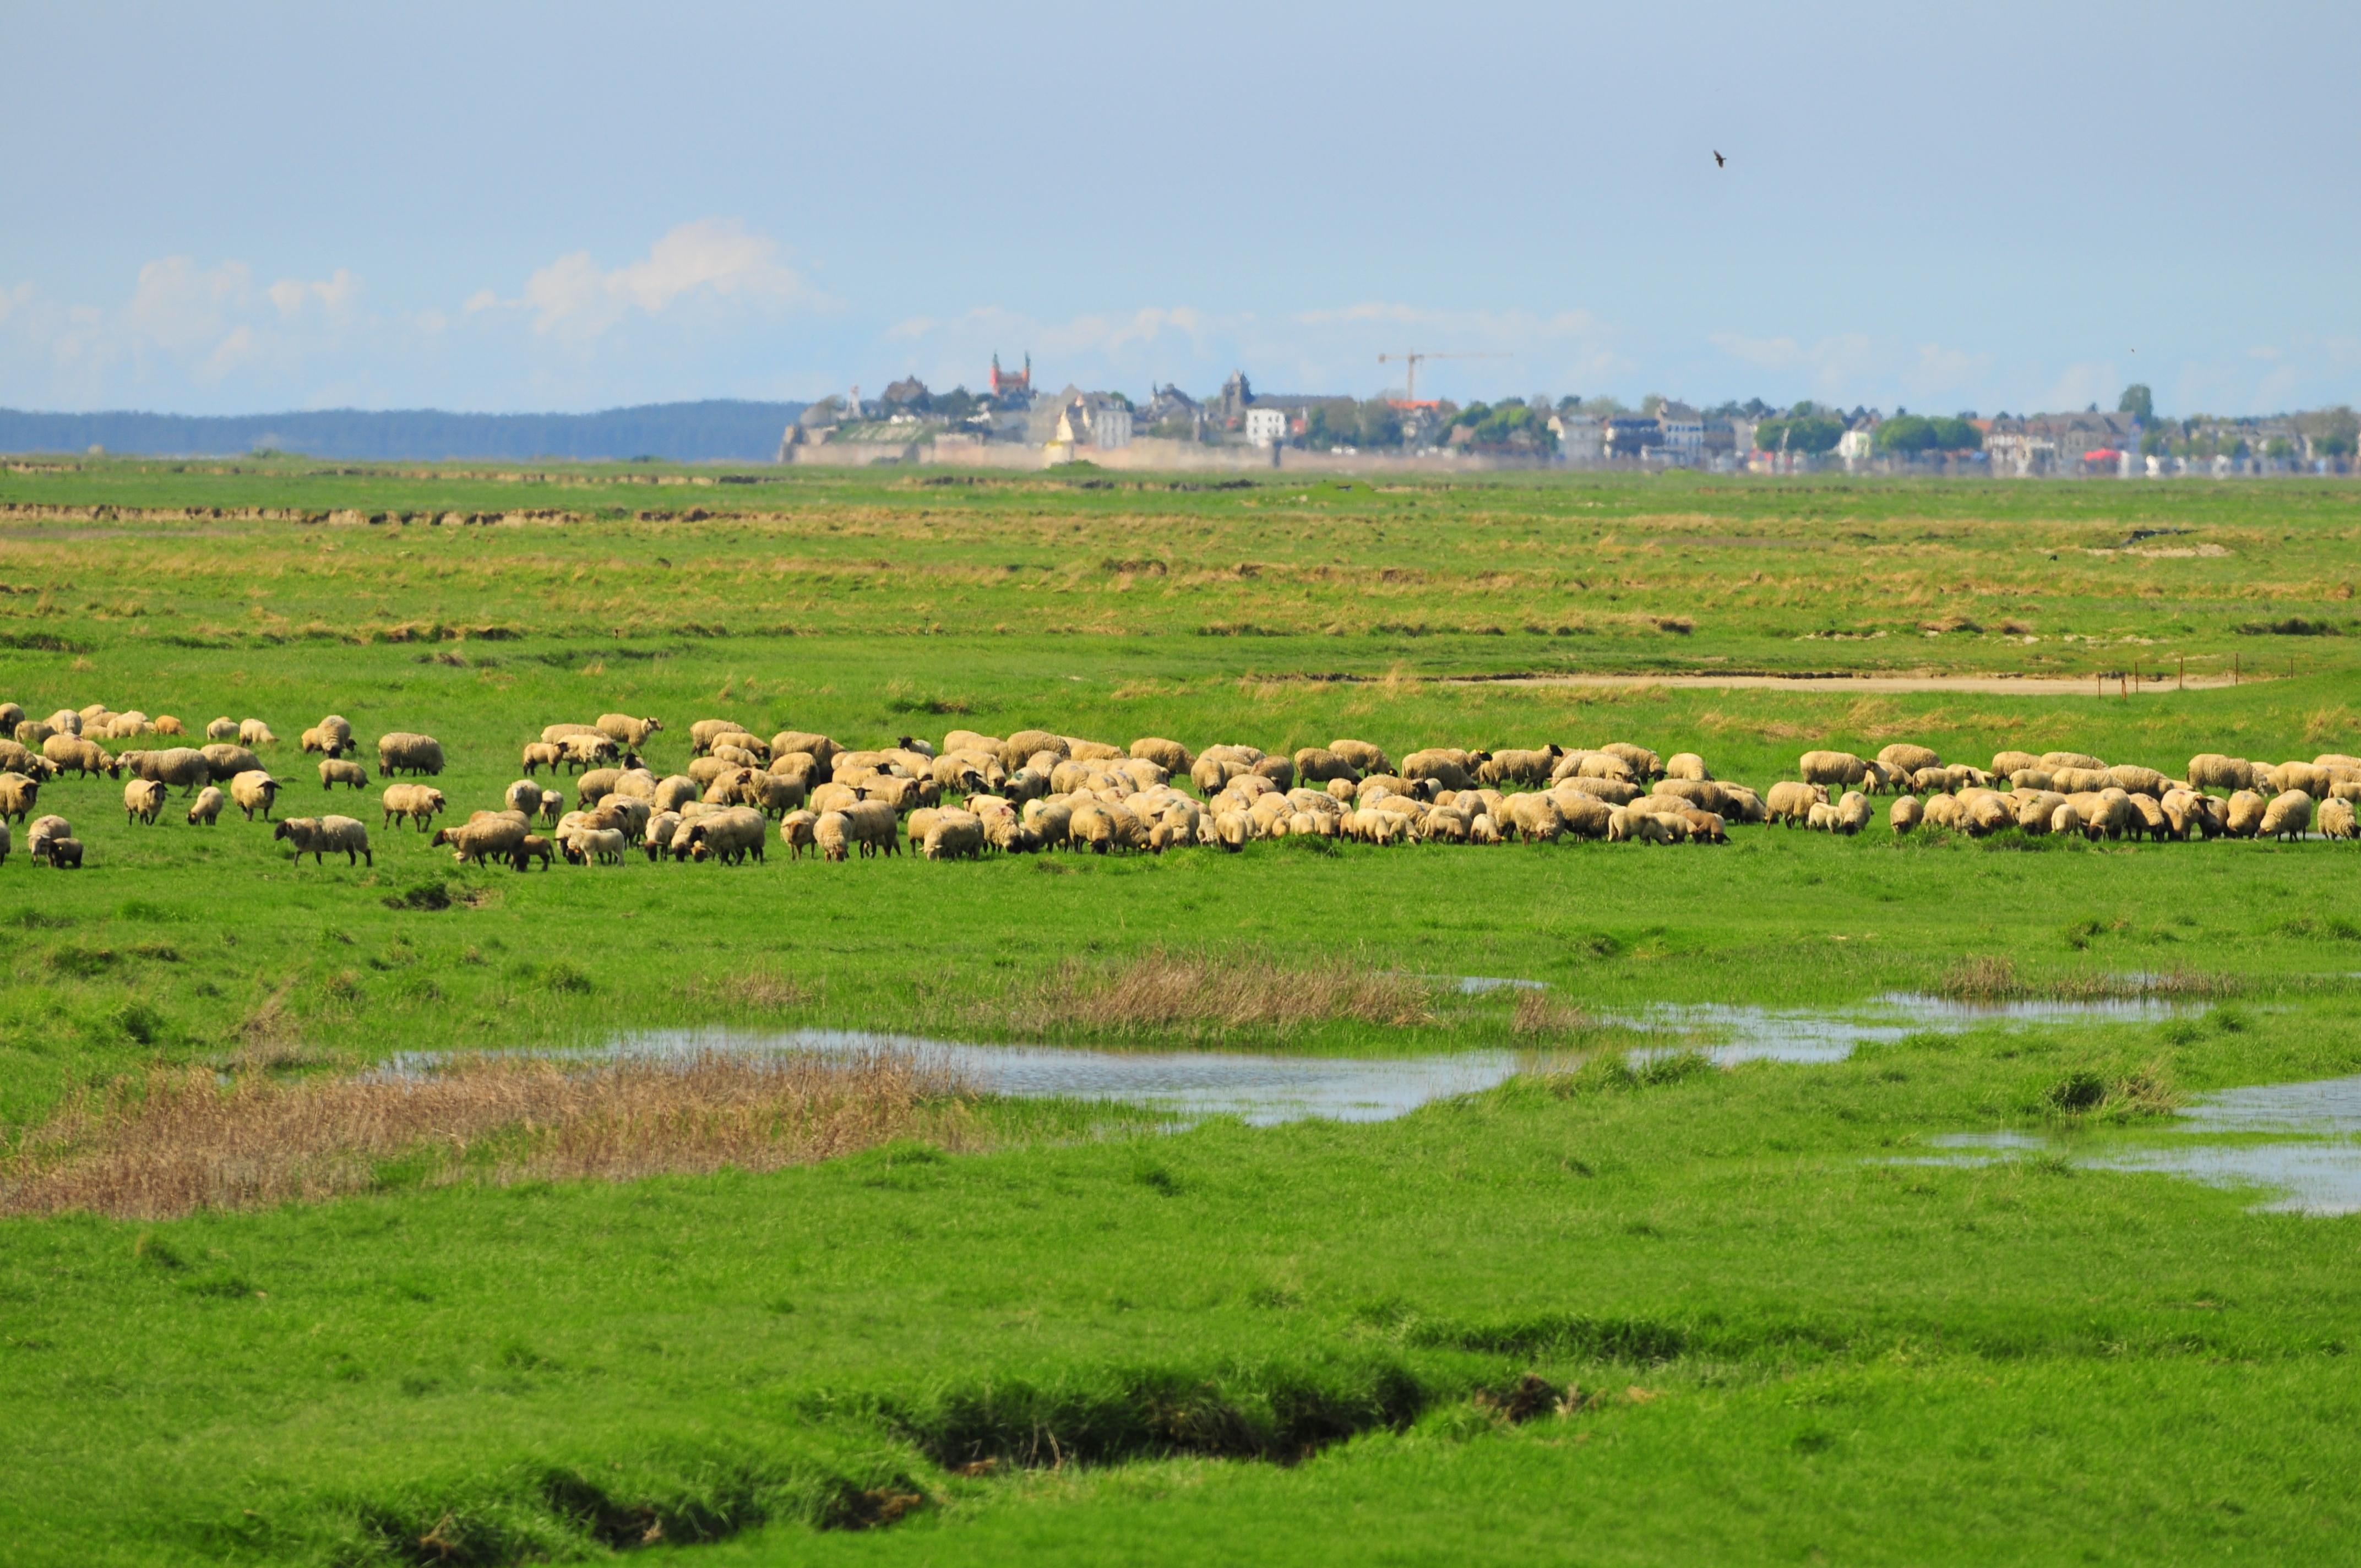 Moutons-ADRT80-FLeonardi